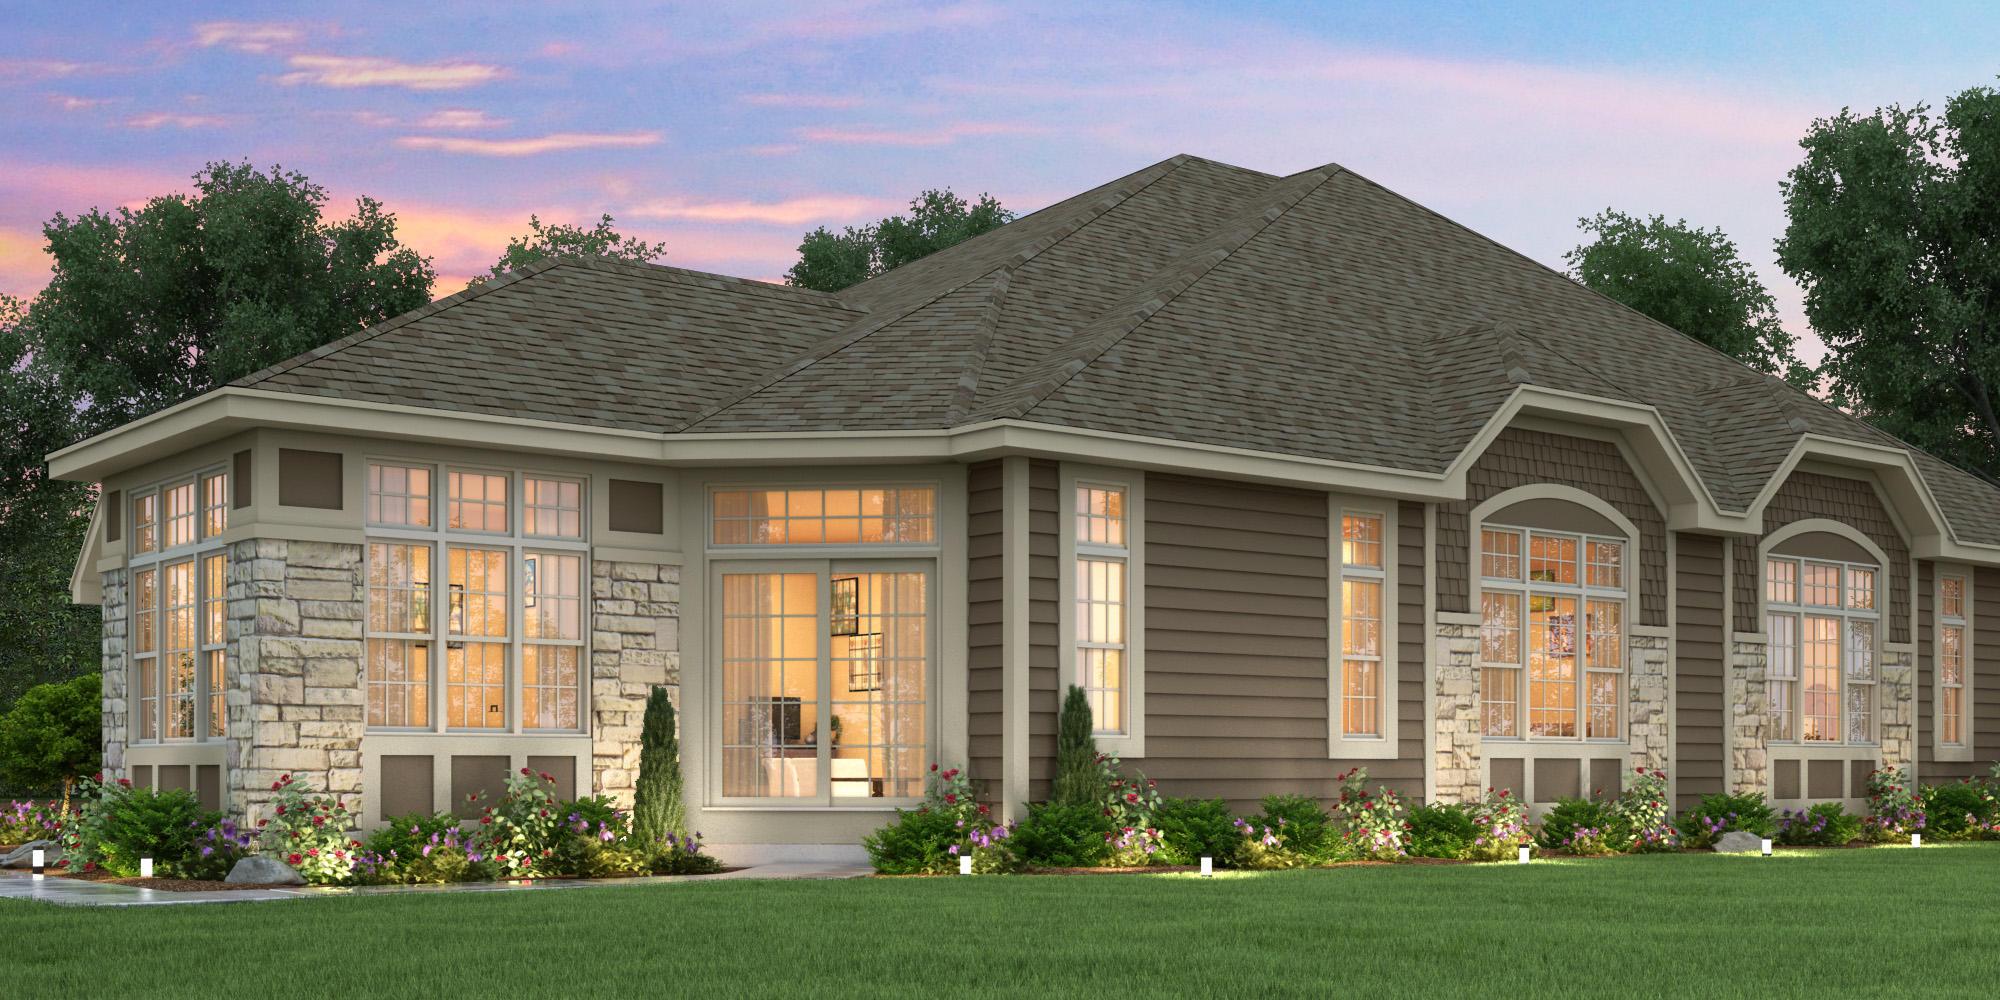 13690 Nighthawk Trl, Brookfield, Wisconsin 53005, 2 Bedrooms Bedrooms, 6 Rooms Rooms,3 BathroomsBathrooms,Condominiums,For Sale,Nighthawk Trl,1,1717488